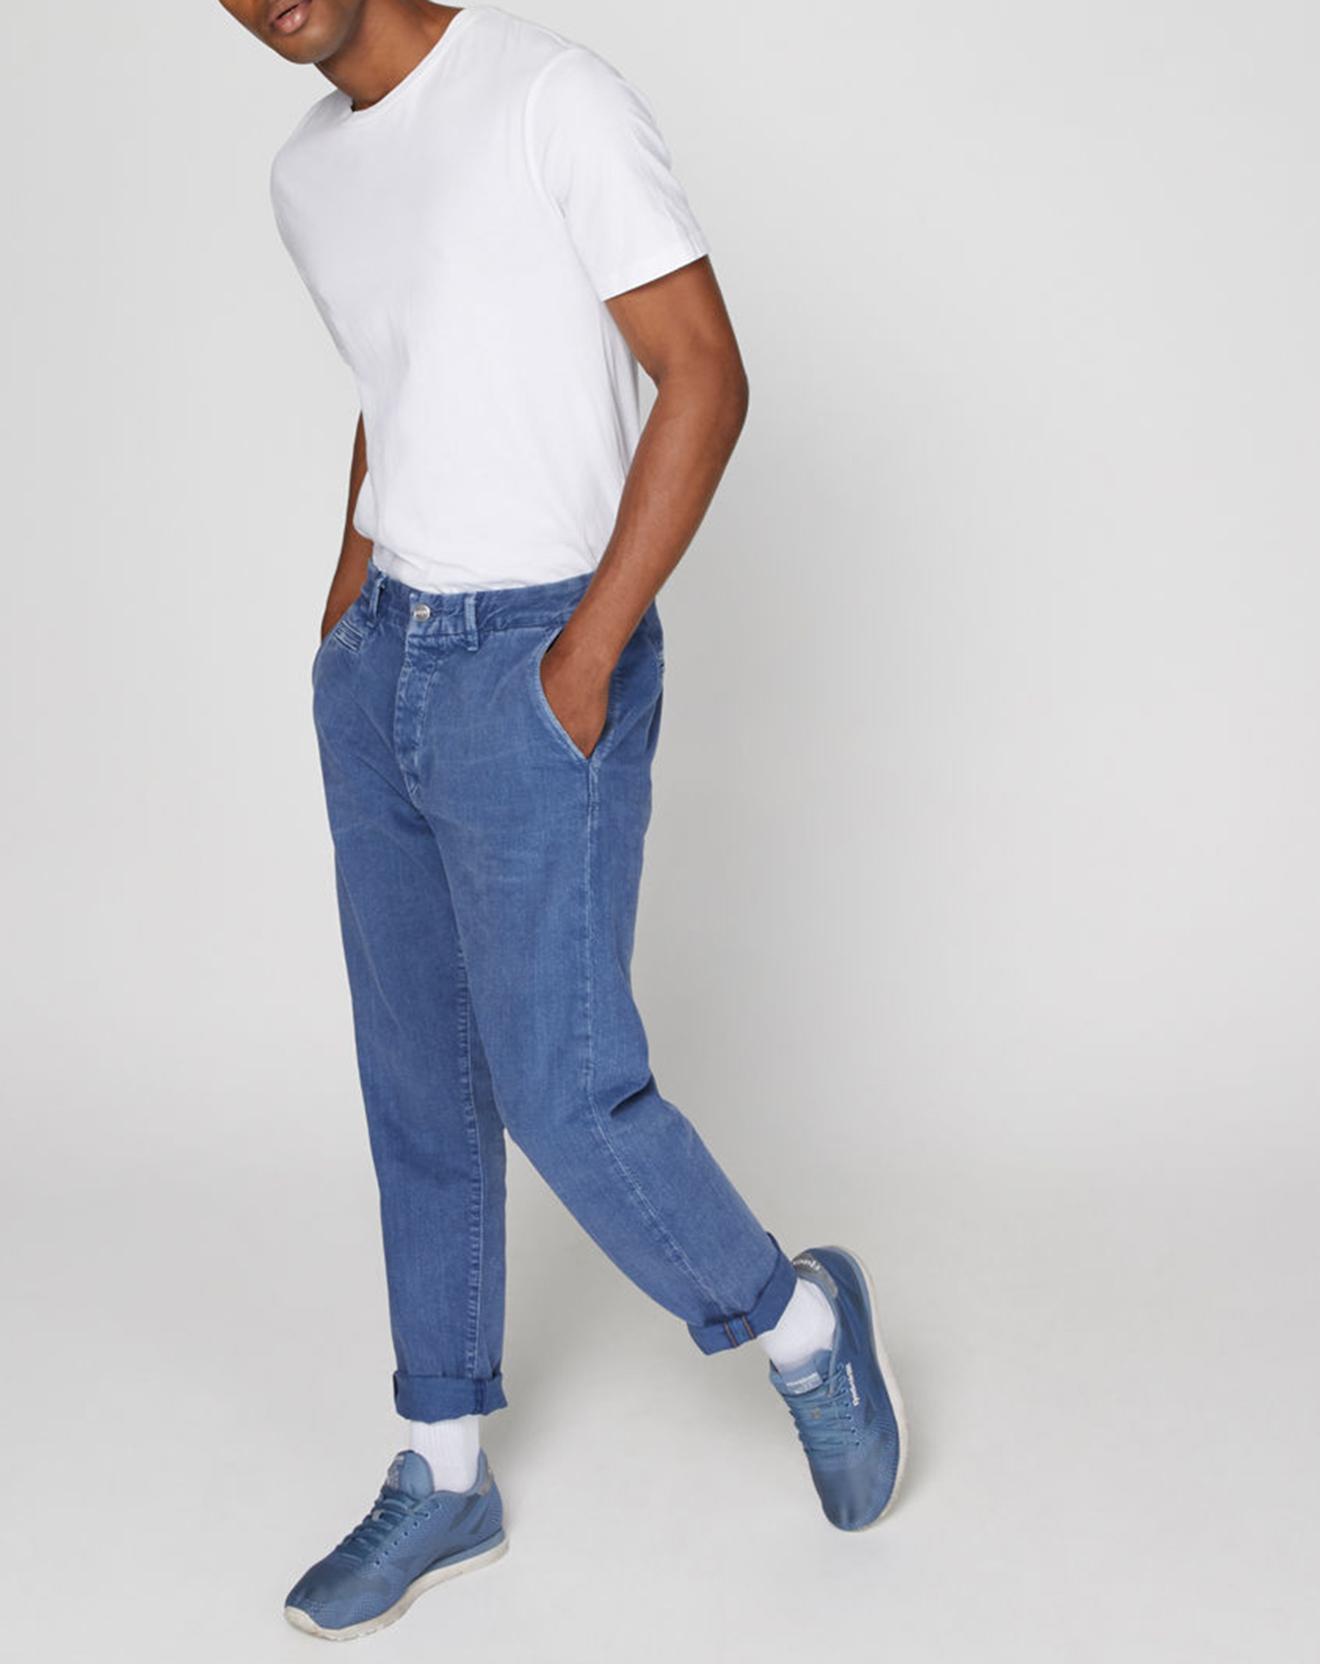 Jean ample Archive bleu - Pepe Jeans - Modalova